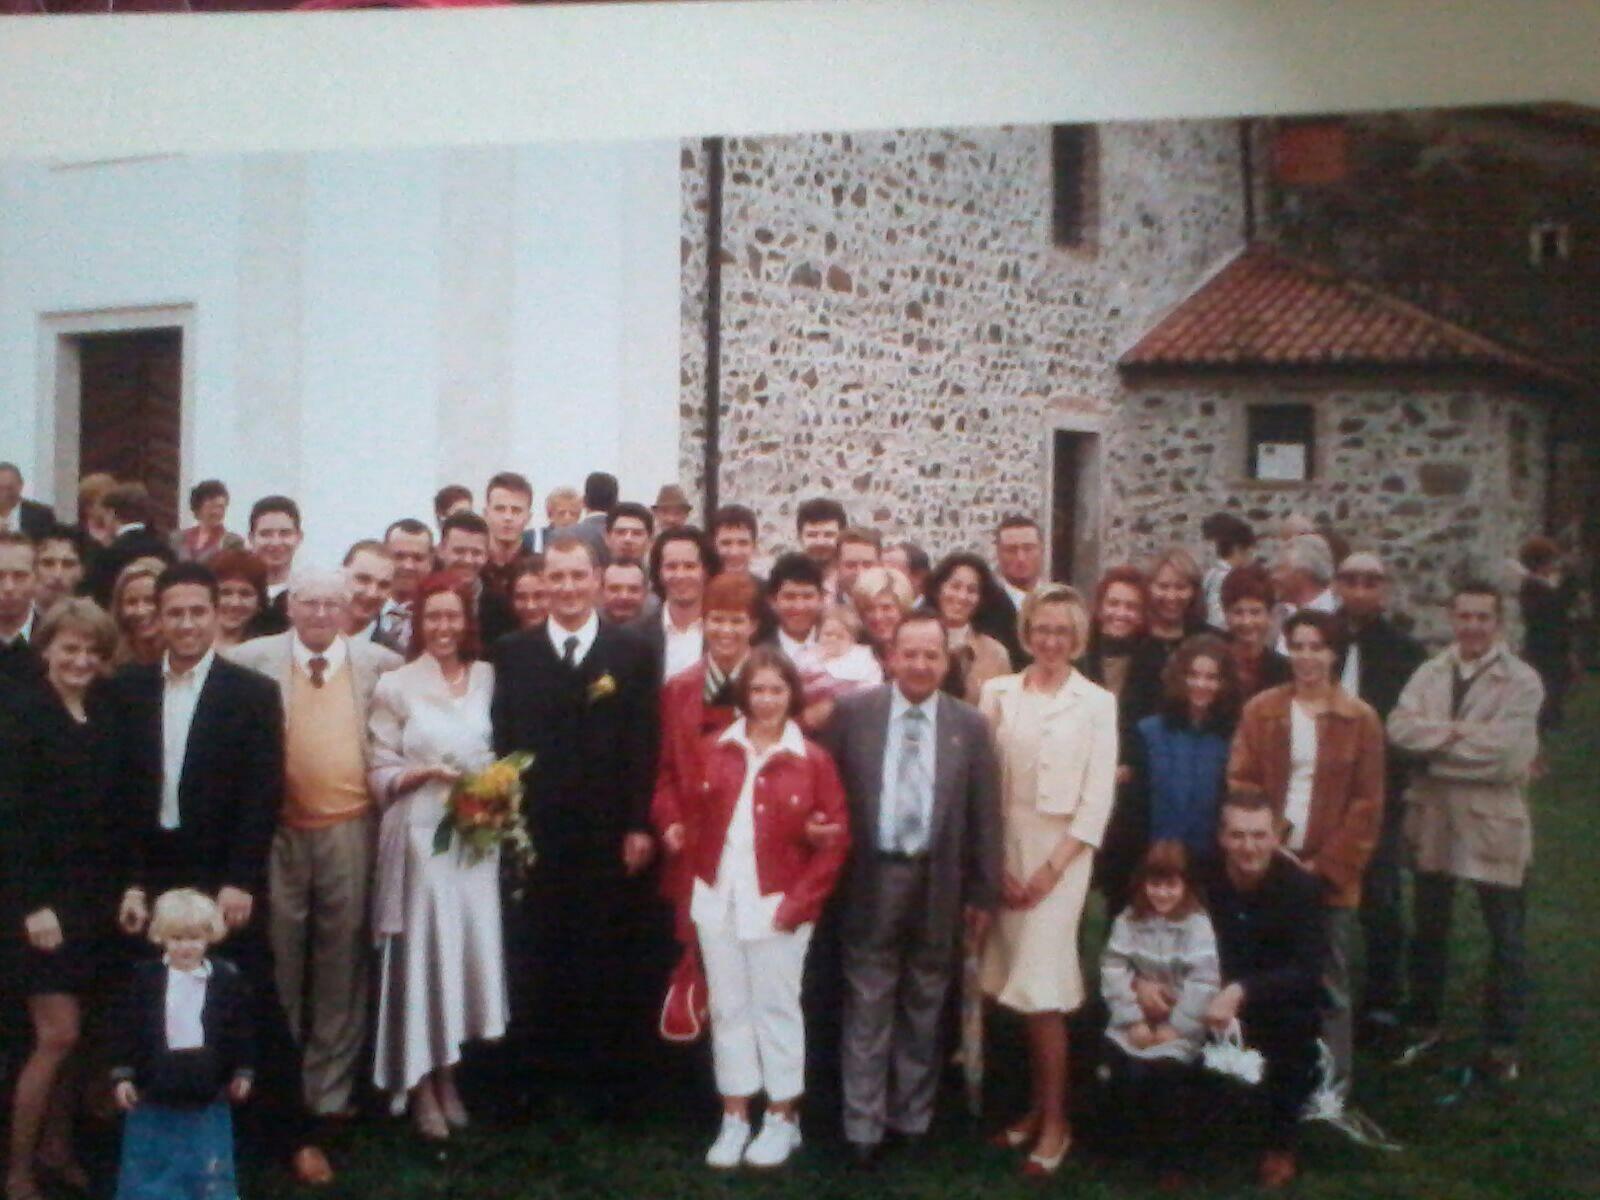 Catia e Gianluca, 30 Settembre 2001 - Foto di gruppo